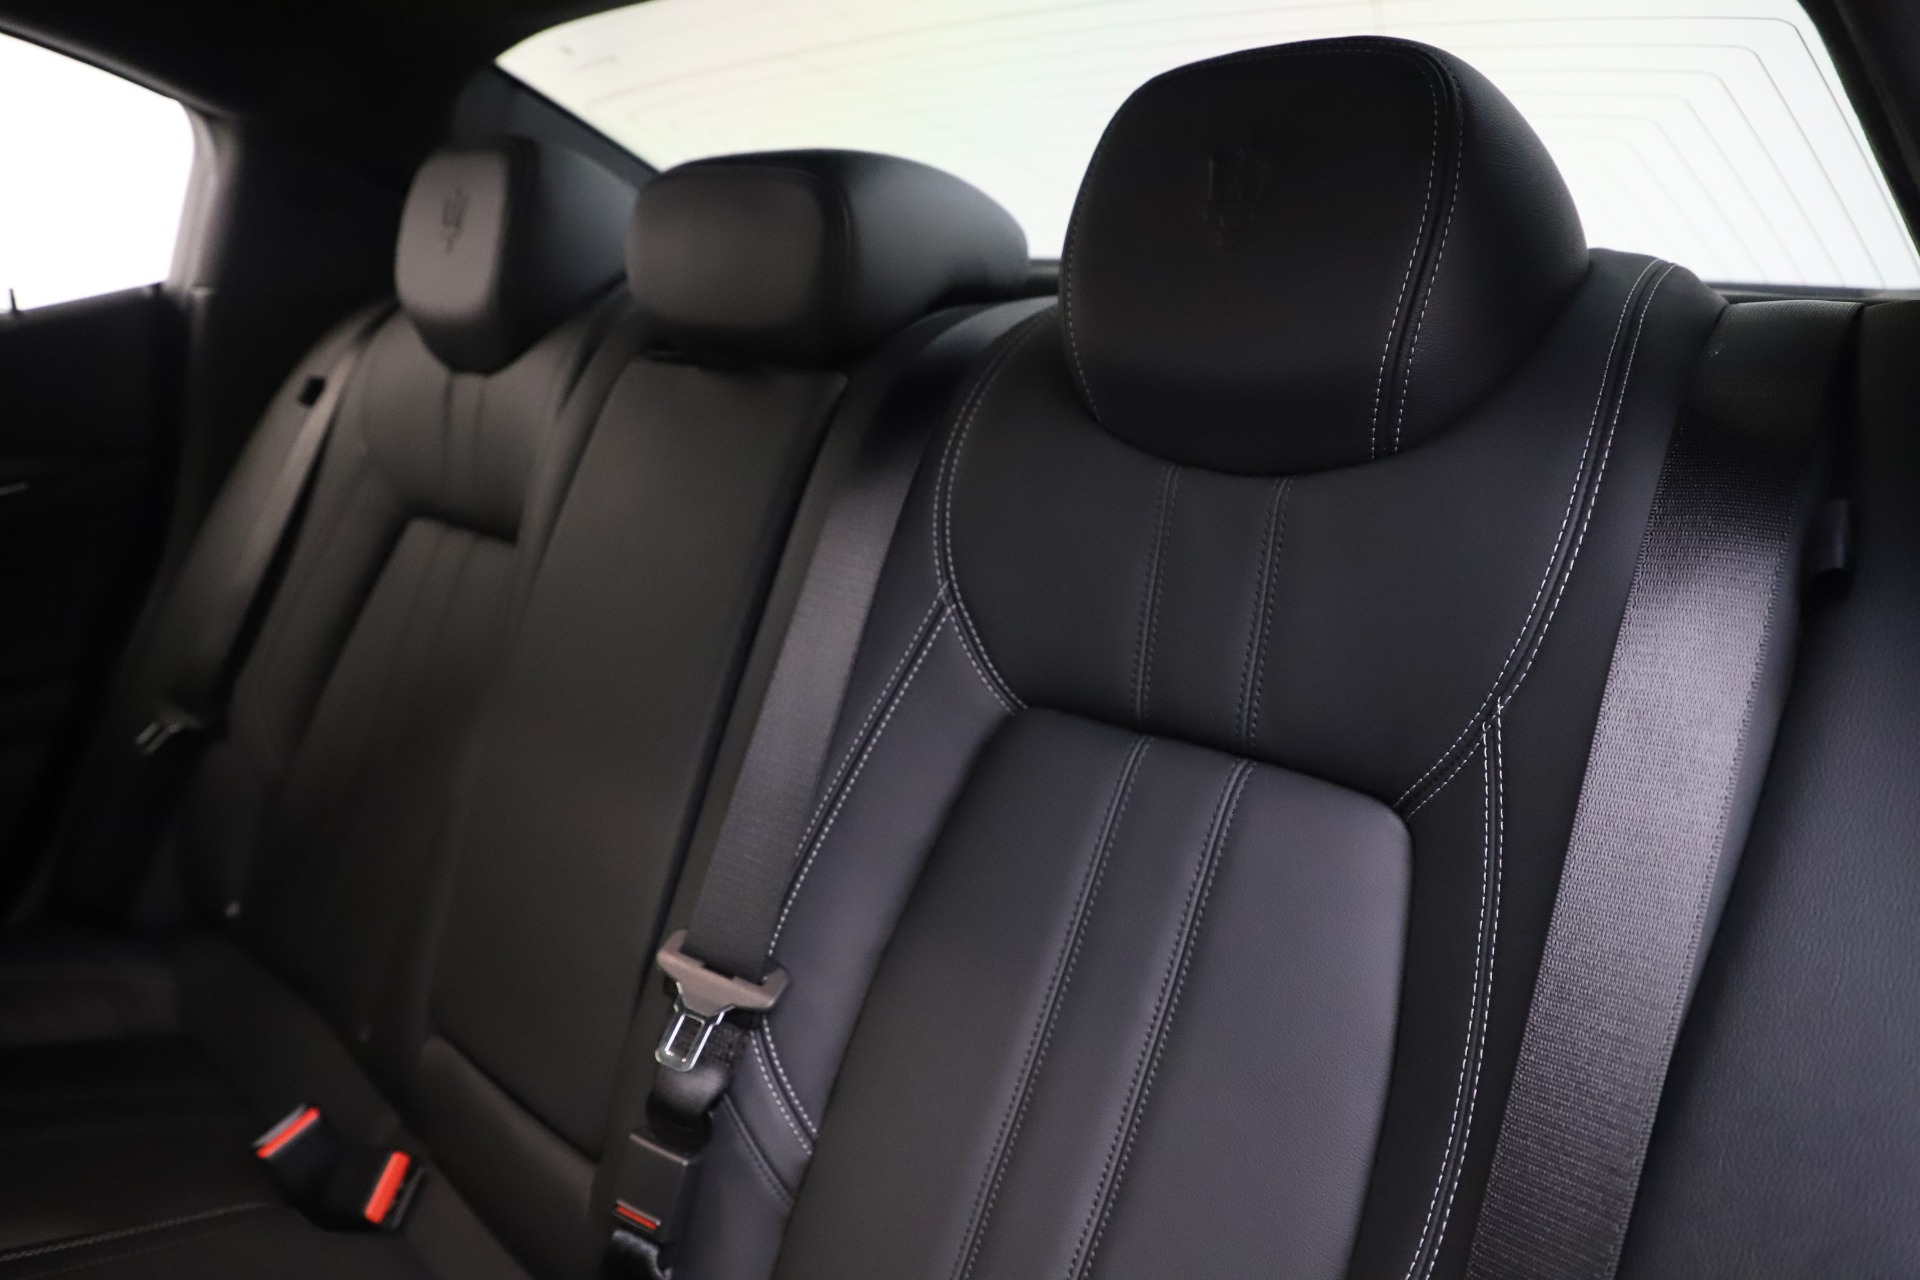 Used 2017 Maserati Ghibli S Q4 For Sale 51900 In Greenwich, CT